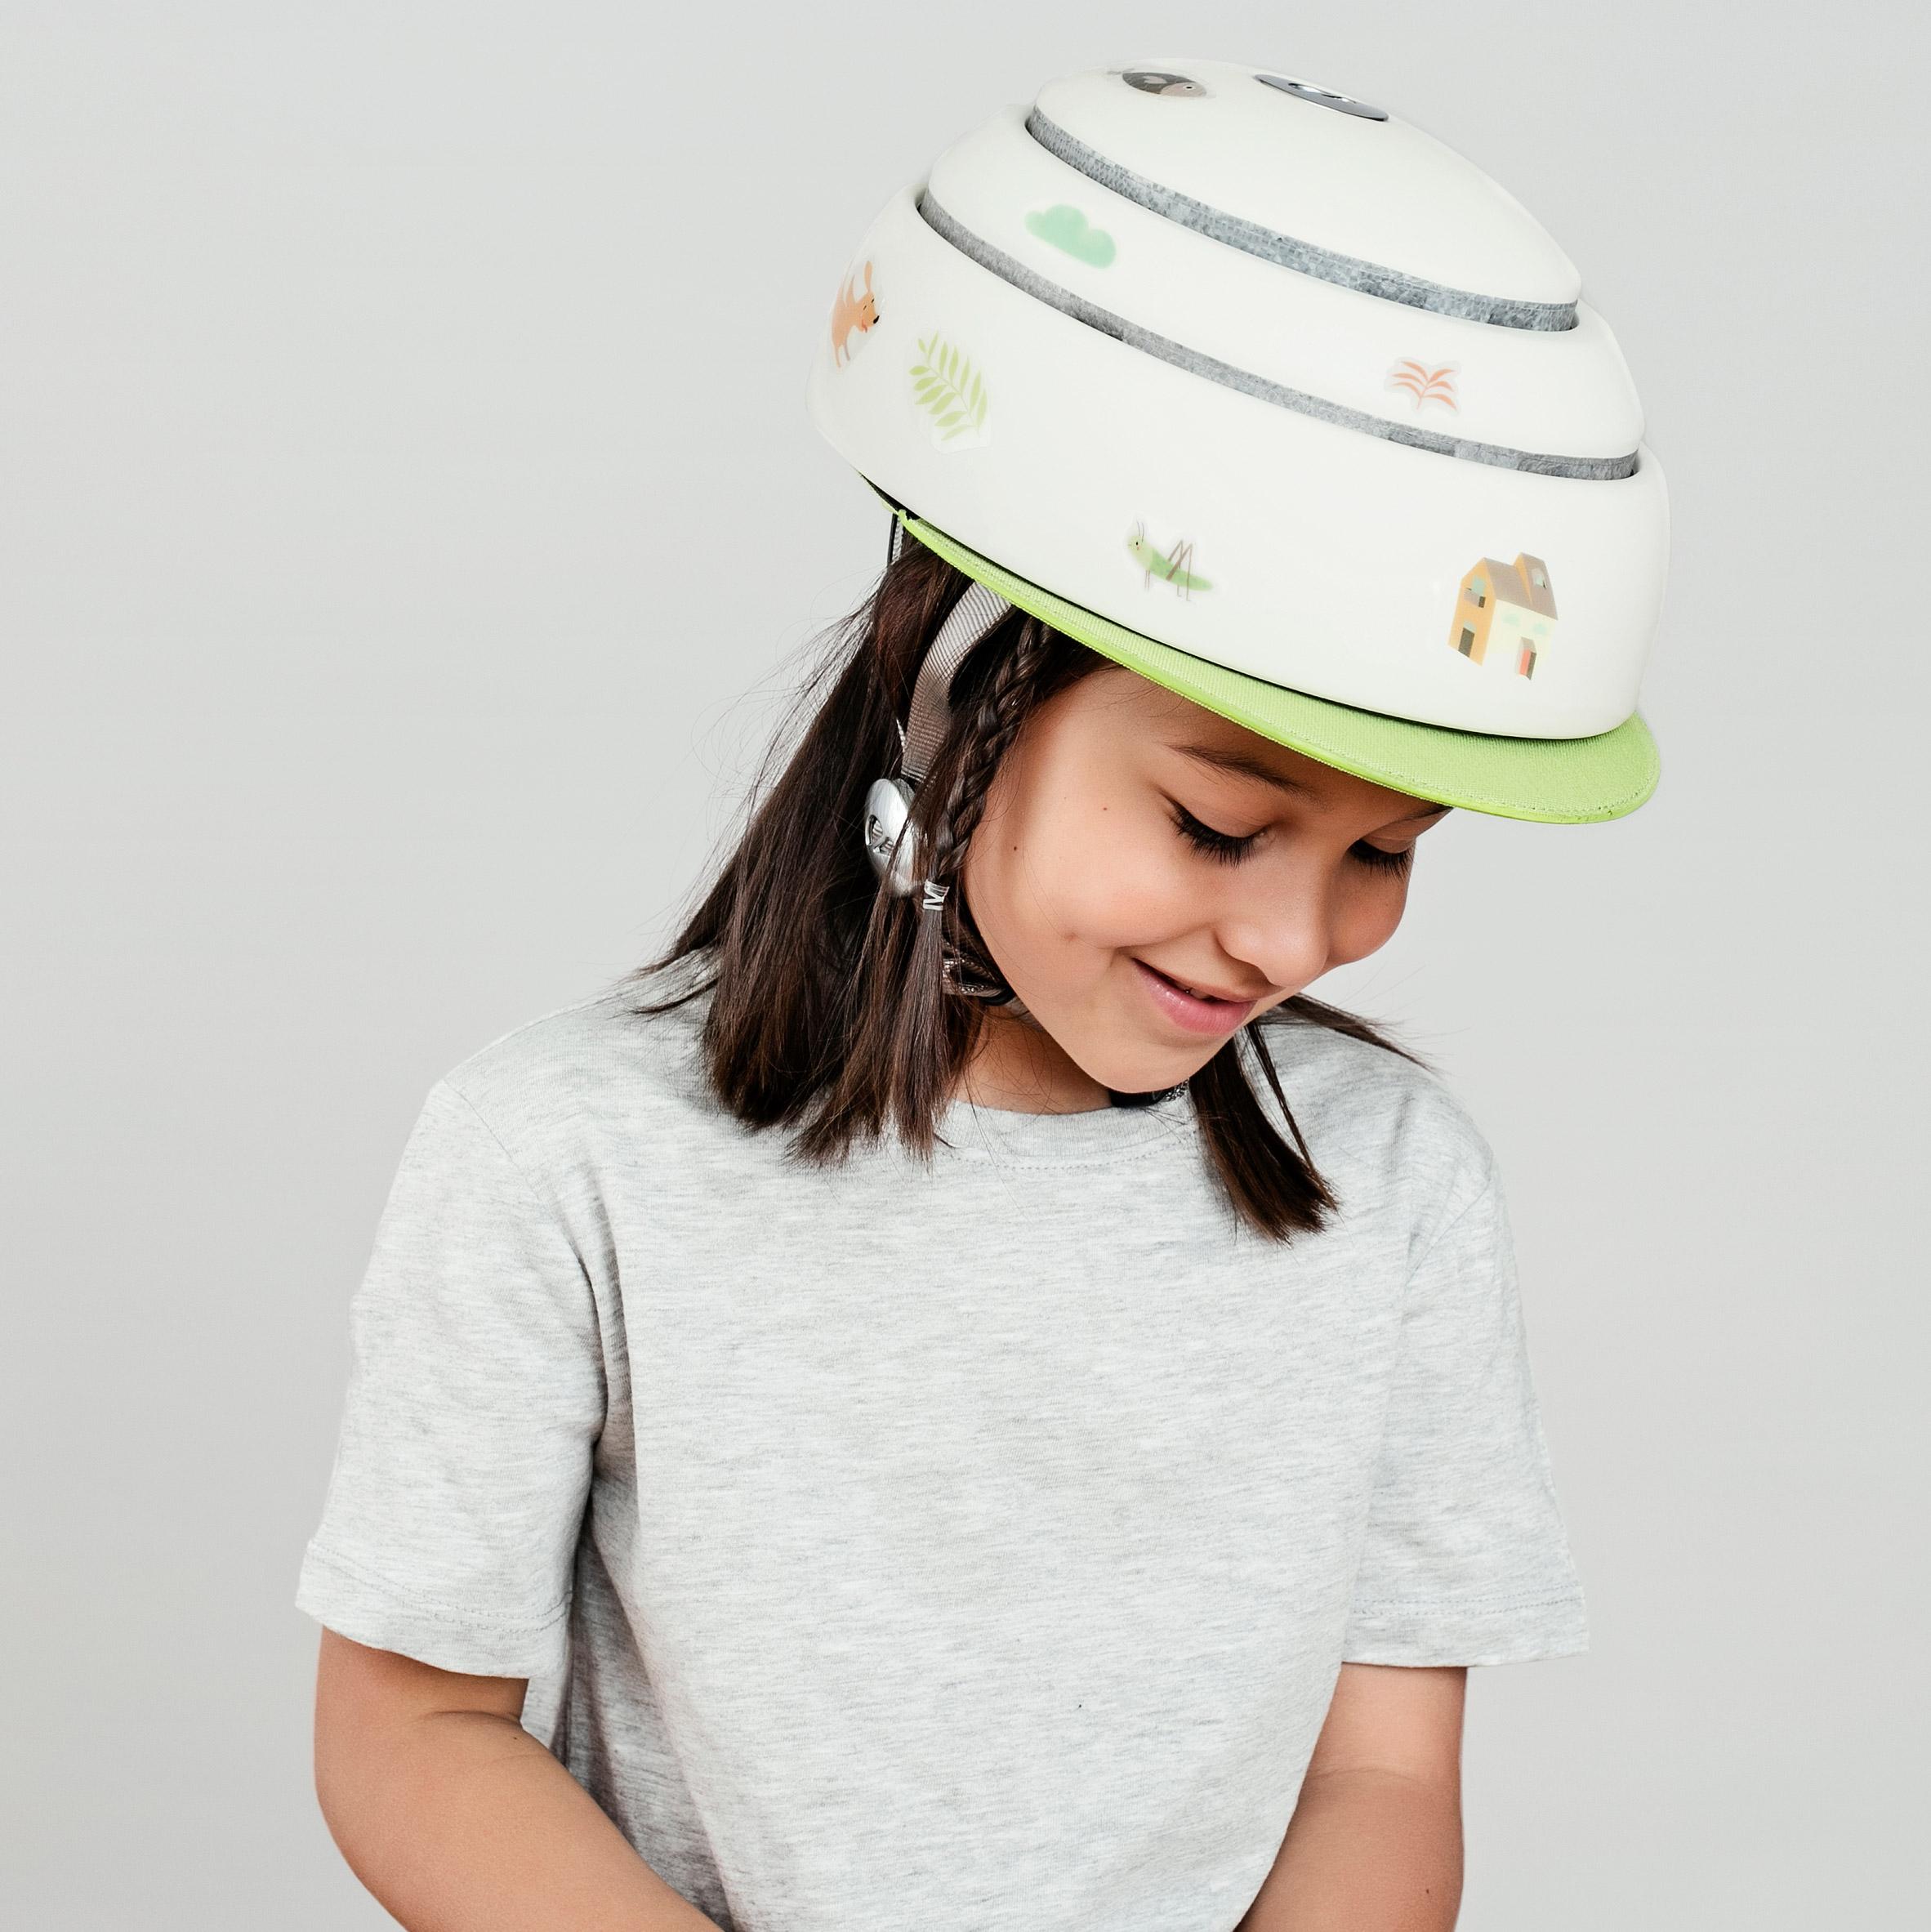 Foldable kids bicycle helmet by Closka